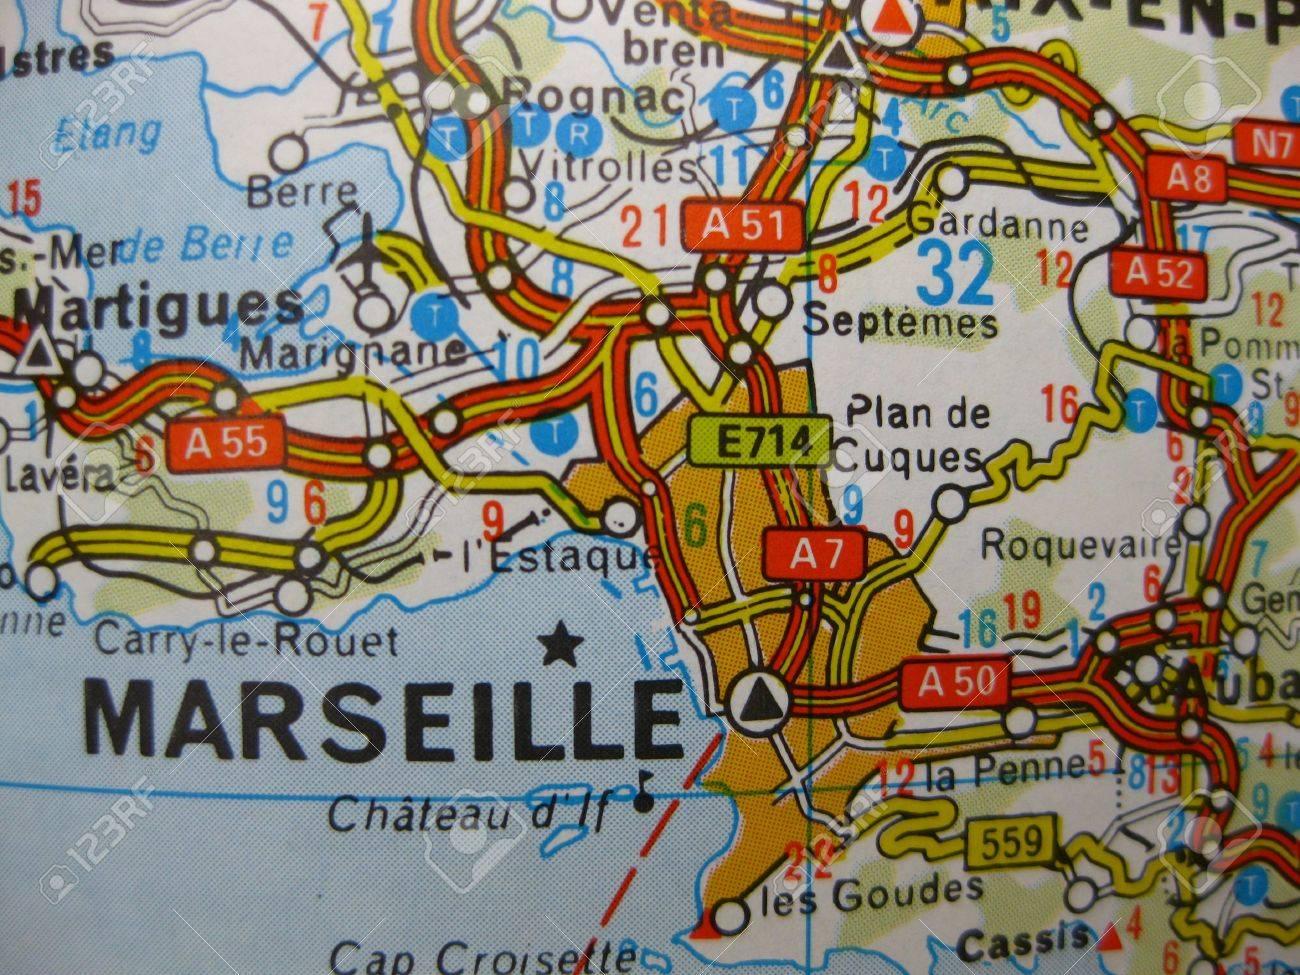 Europa En Siete Dias Mapa De Marsella Francia Fotos Retratos